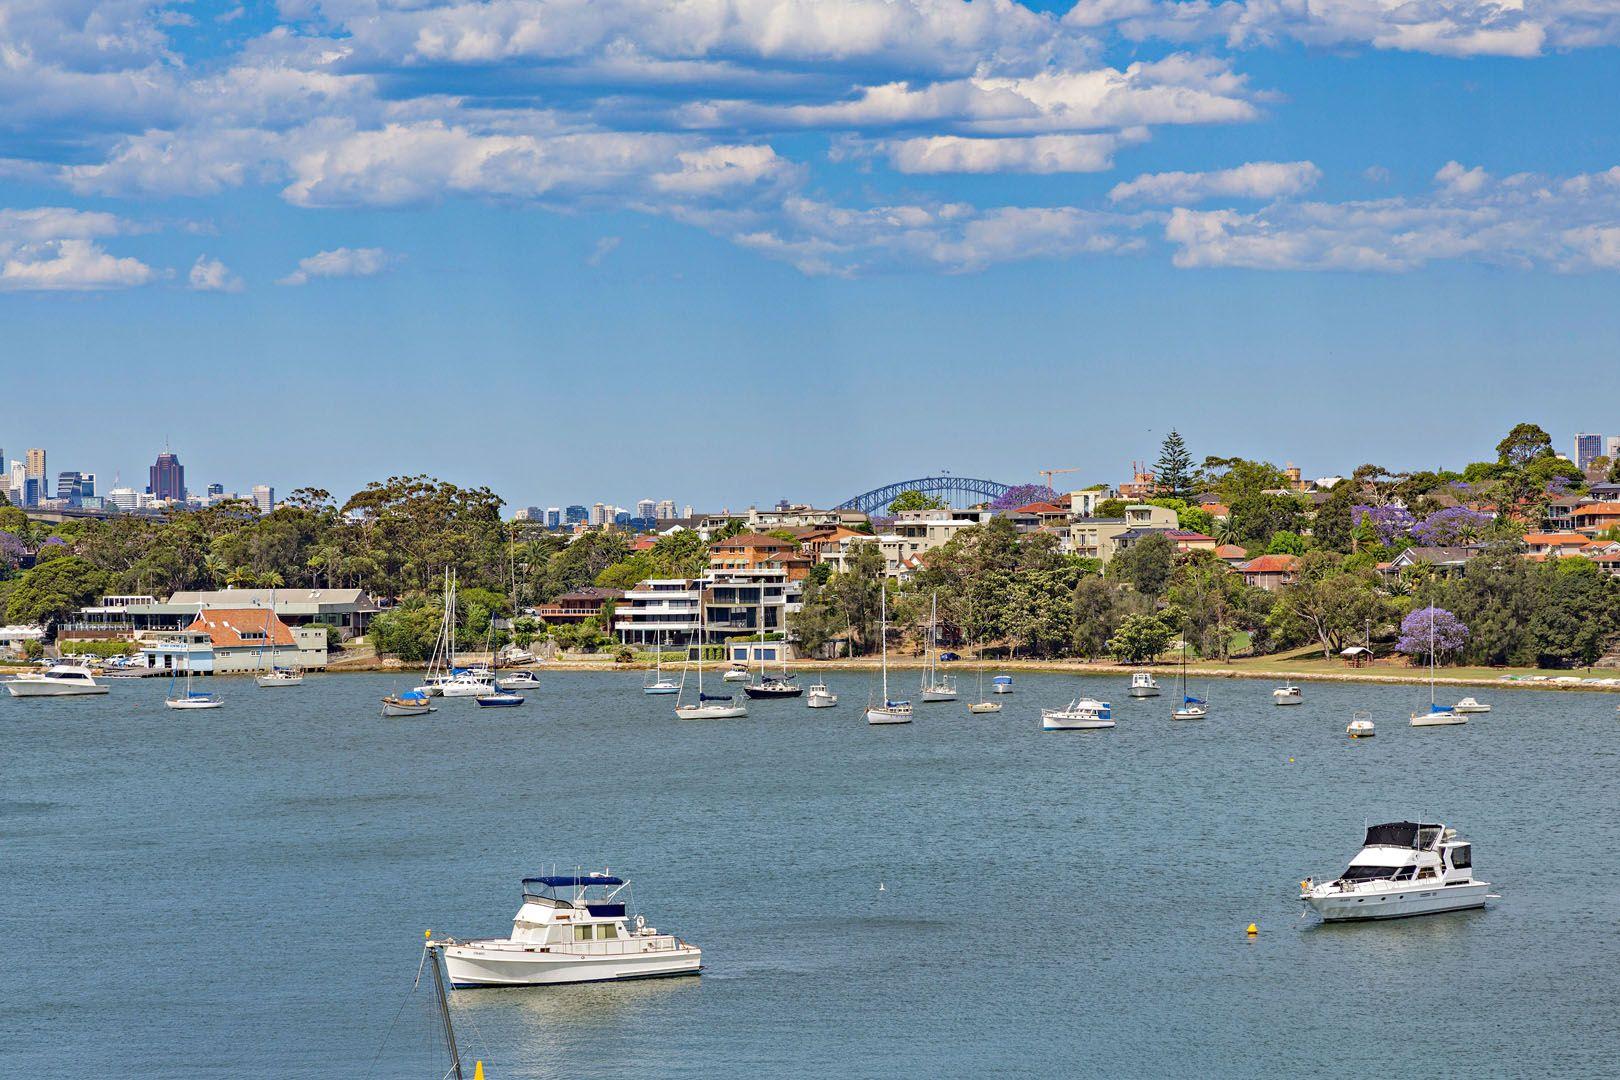 61/1 Bayside Terrace, Cabarita NSW 2137, Image 0